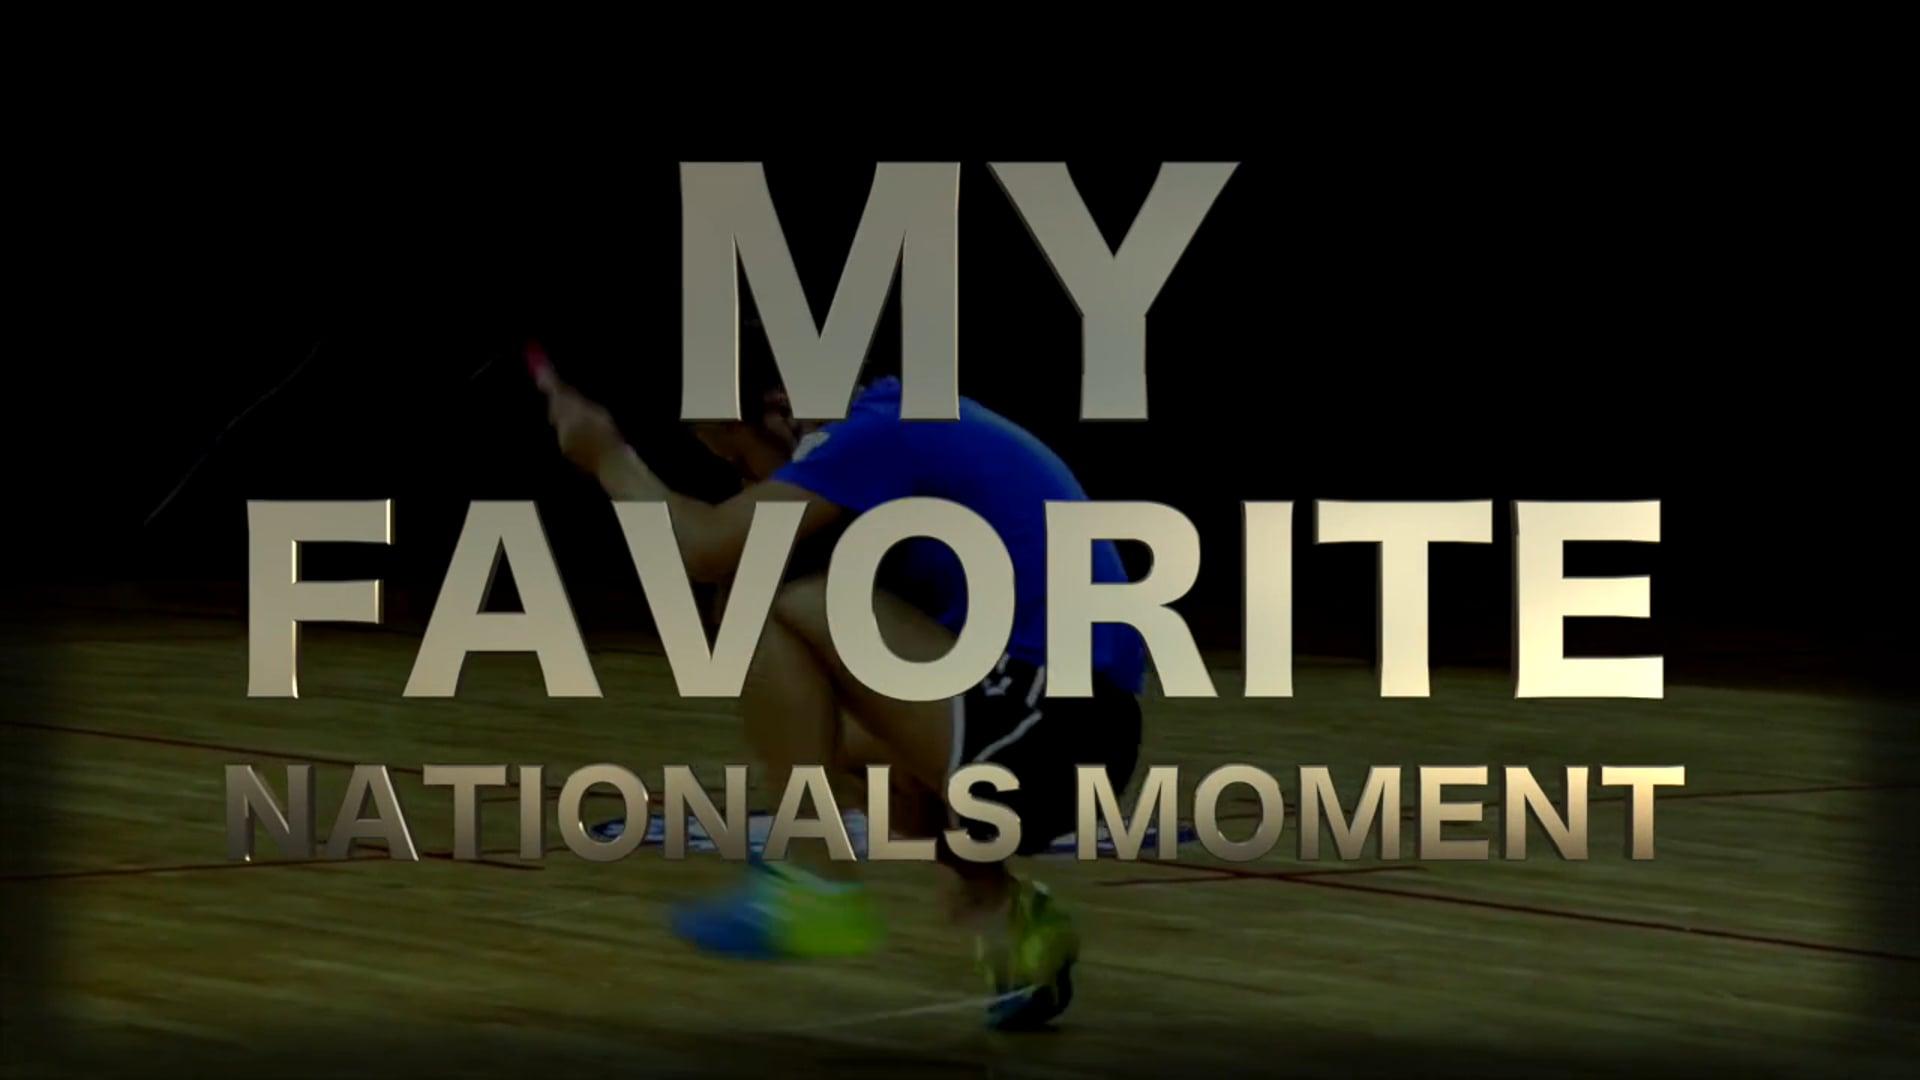 My Nationals Moment - Brett